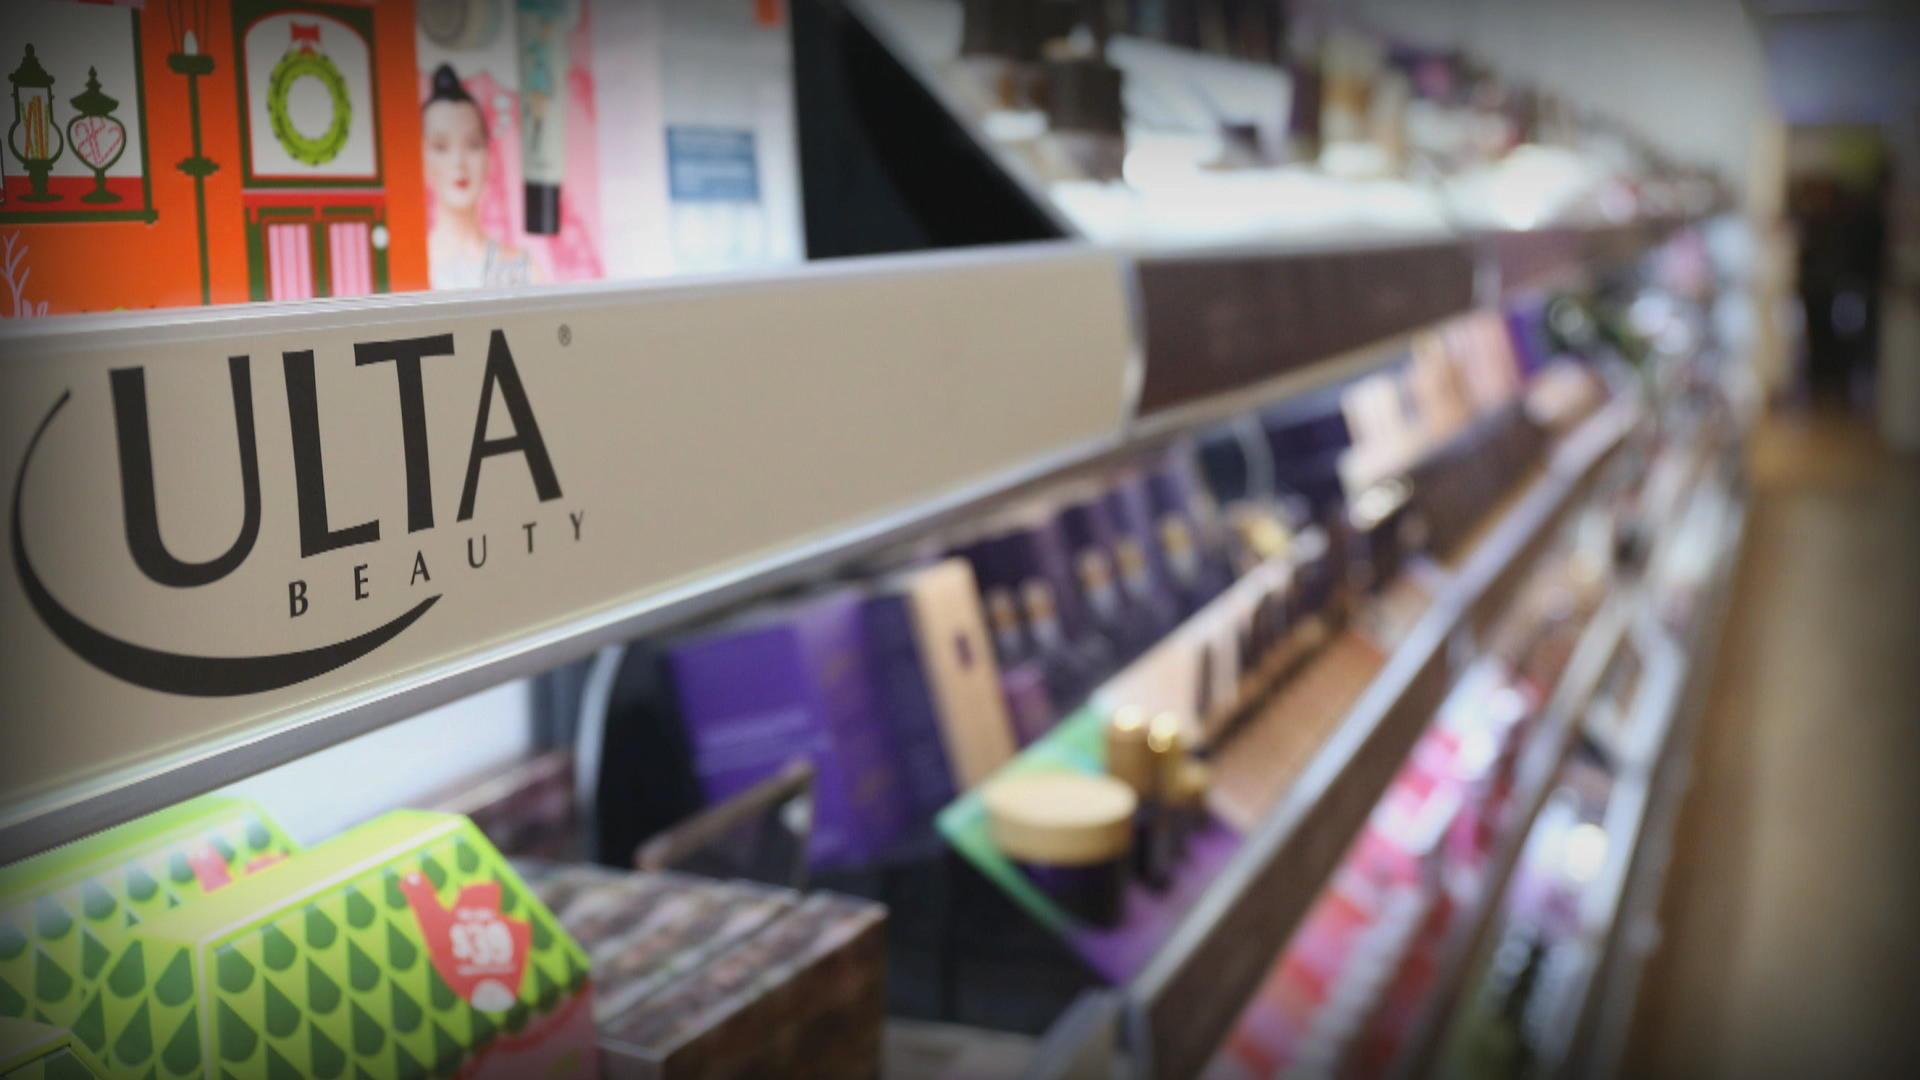 Former Ulta Beauty employee says she felt pressured to